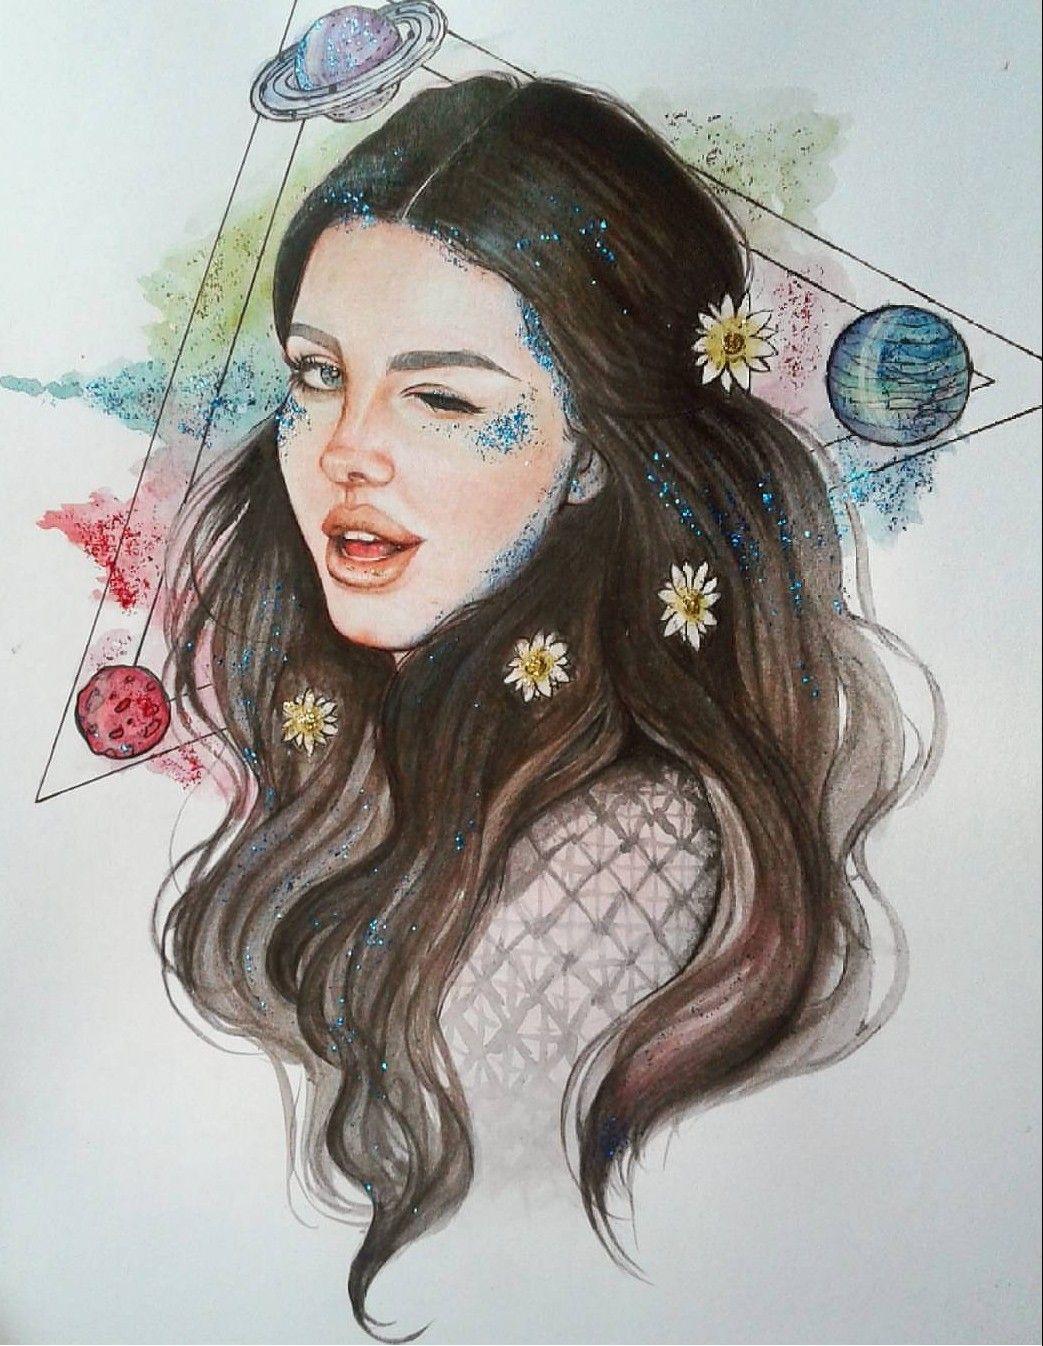 Lana Del Rey Ldr Art By Patricia Zierhut Lana Del Rey Art Ldr Art Sketches